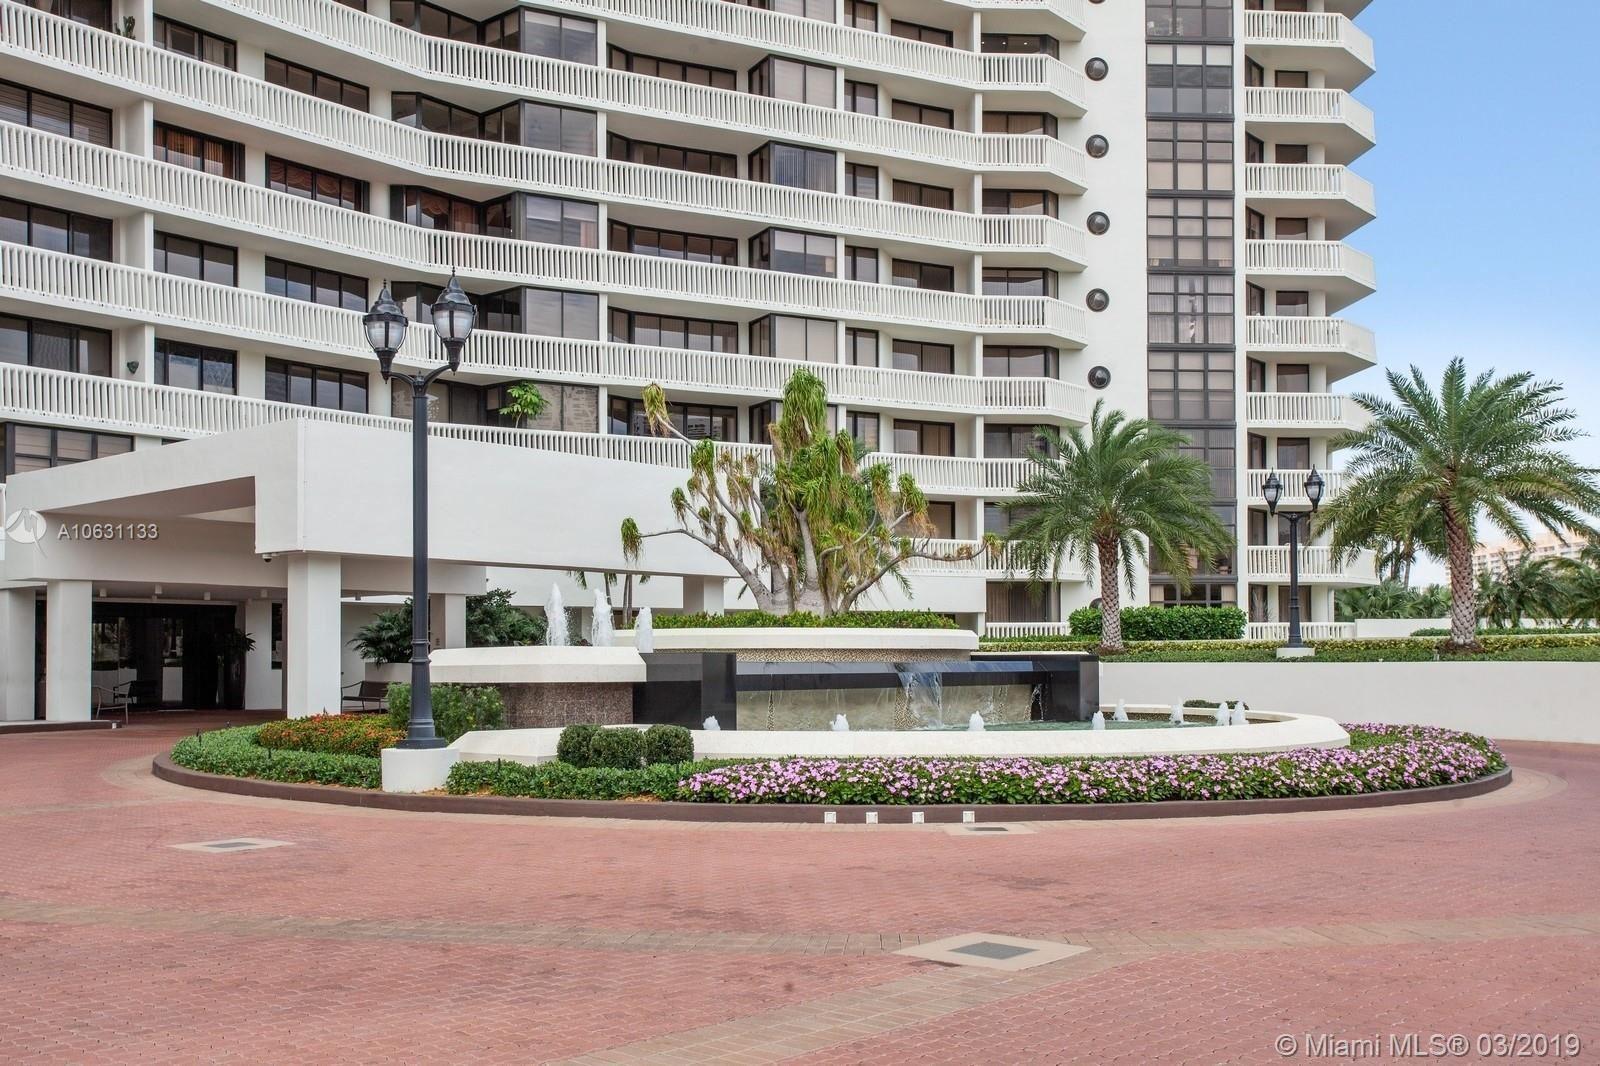 1000 W Island Blvd #313, Aventura, FL 33160 - #: A10631133